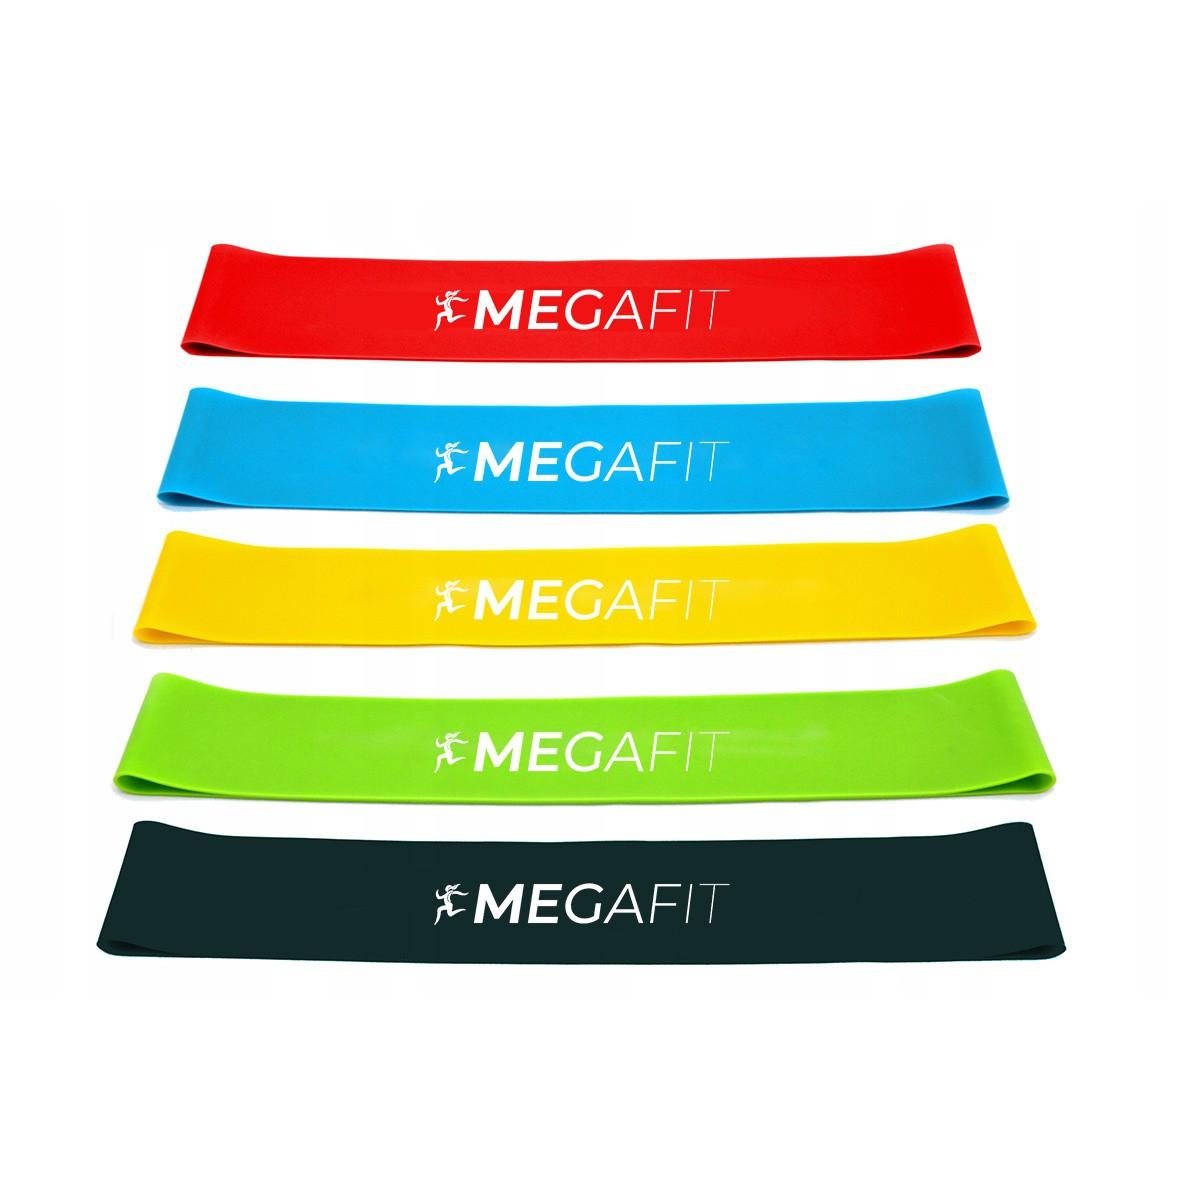 odporové gumy posilovací na cvičení sada 5ks taška megamix.shop